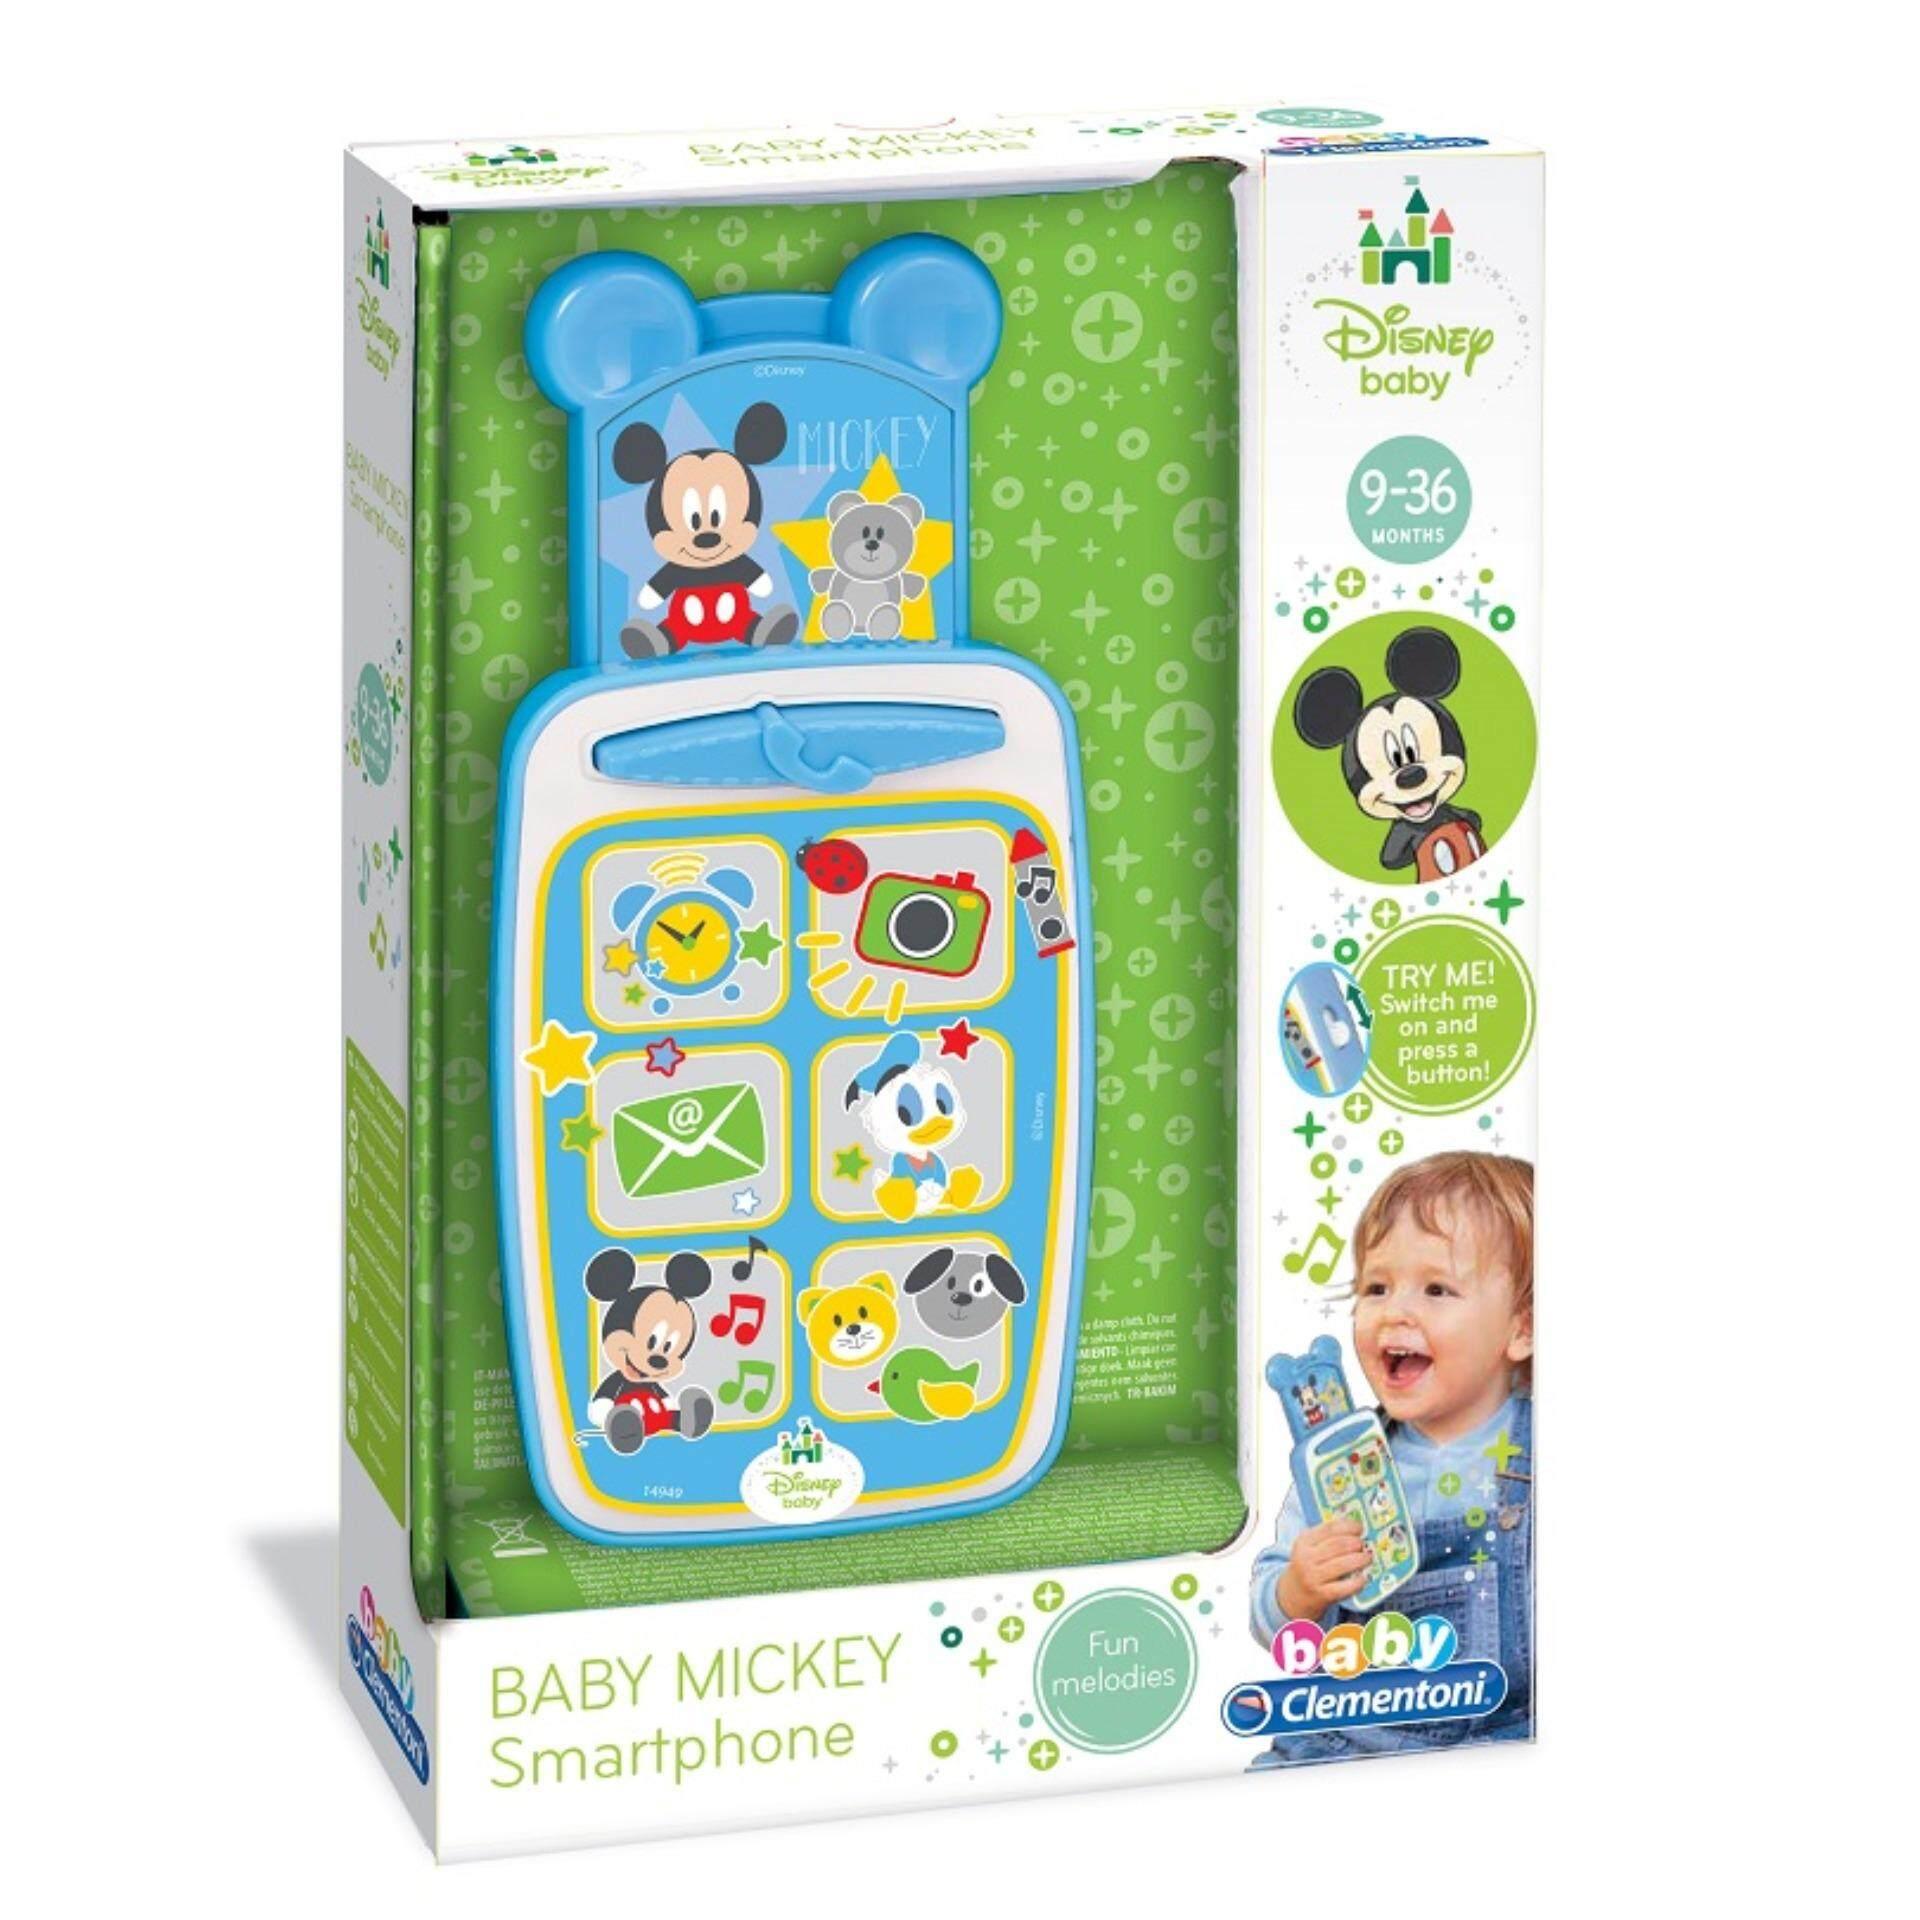 Disney Baby Developmental Musical Smartphone Toys - Mickey toys education